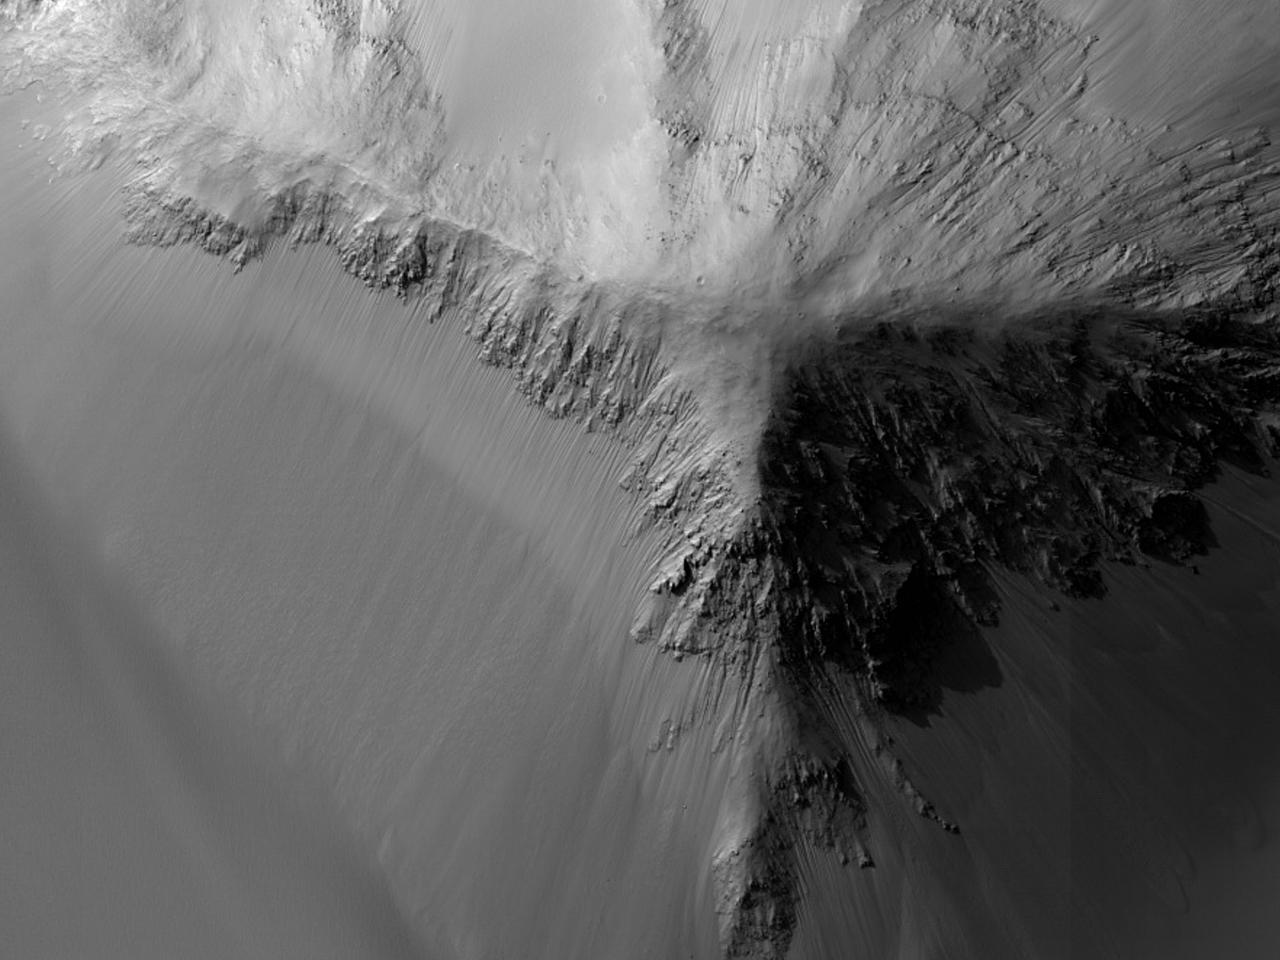 Monitorizarea pantelor în Juventae Chasma